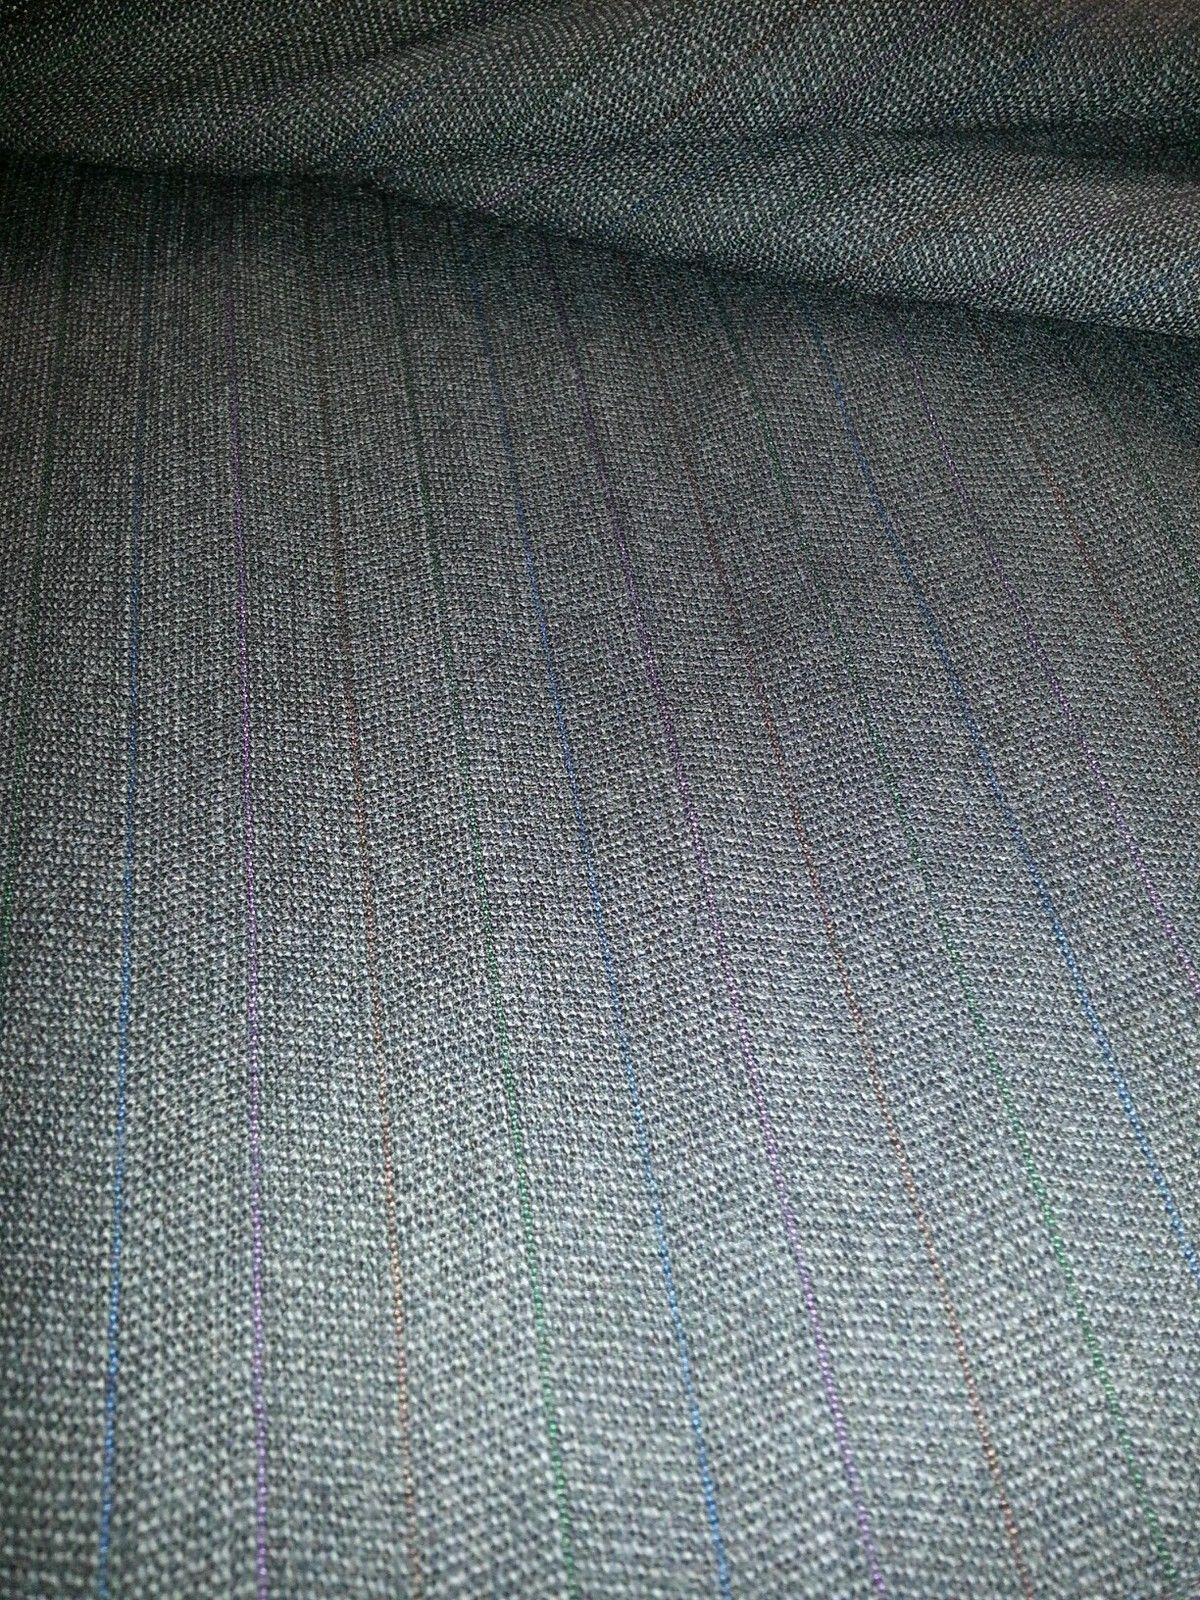 6 YARD Grey  SUPER 110'S  WOOL DESIGNER SUIT FABRIC MSRP $850